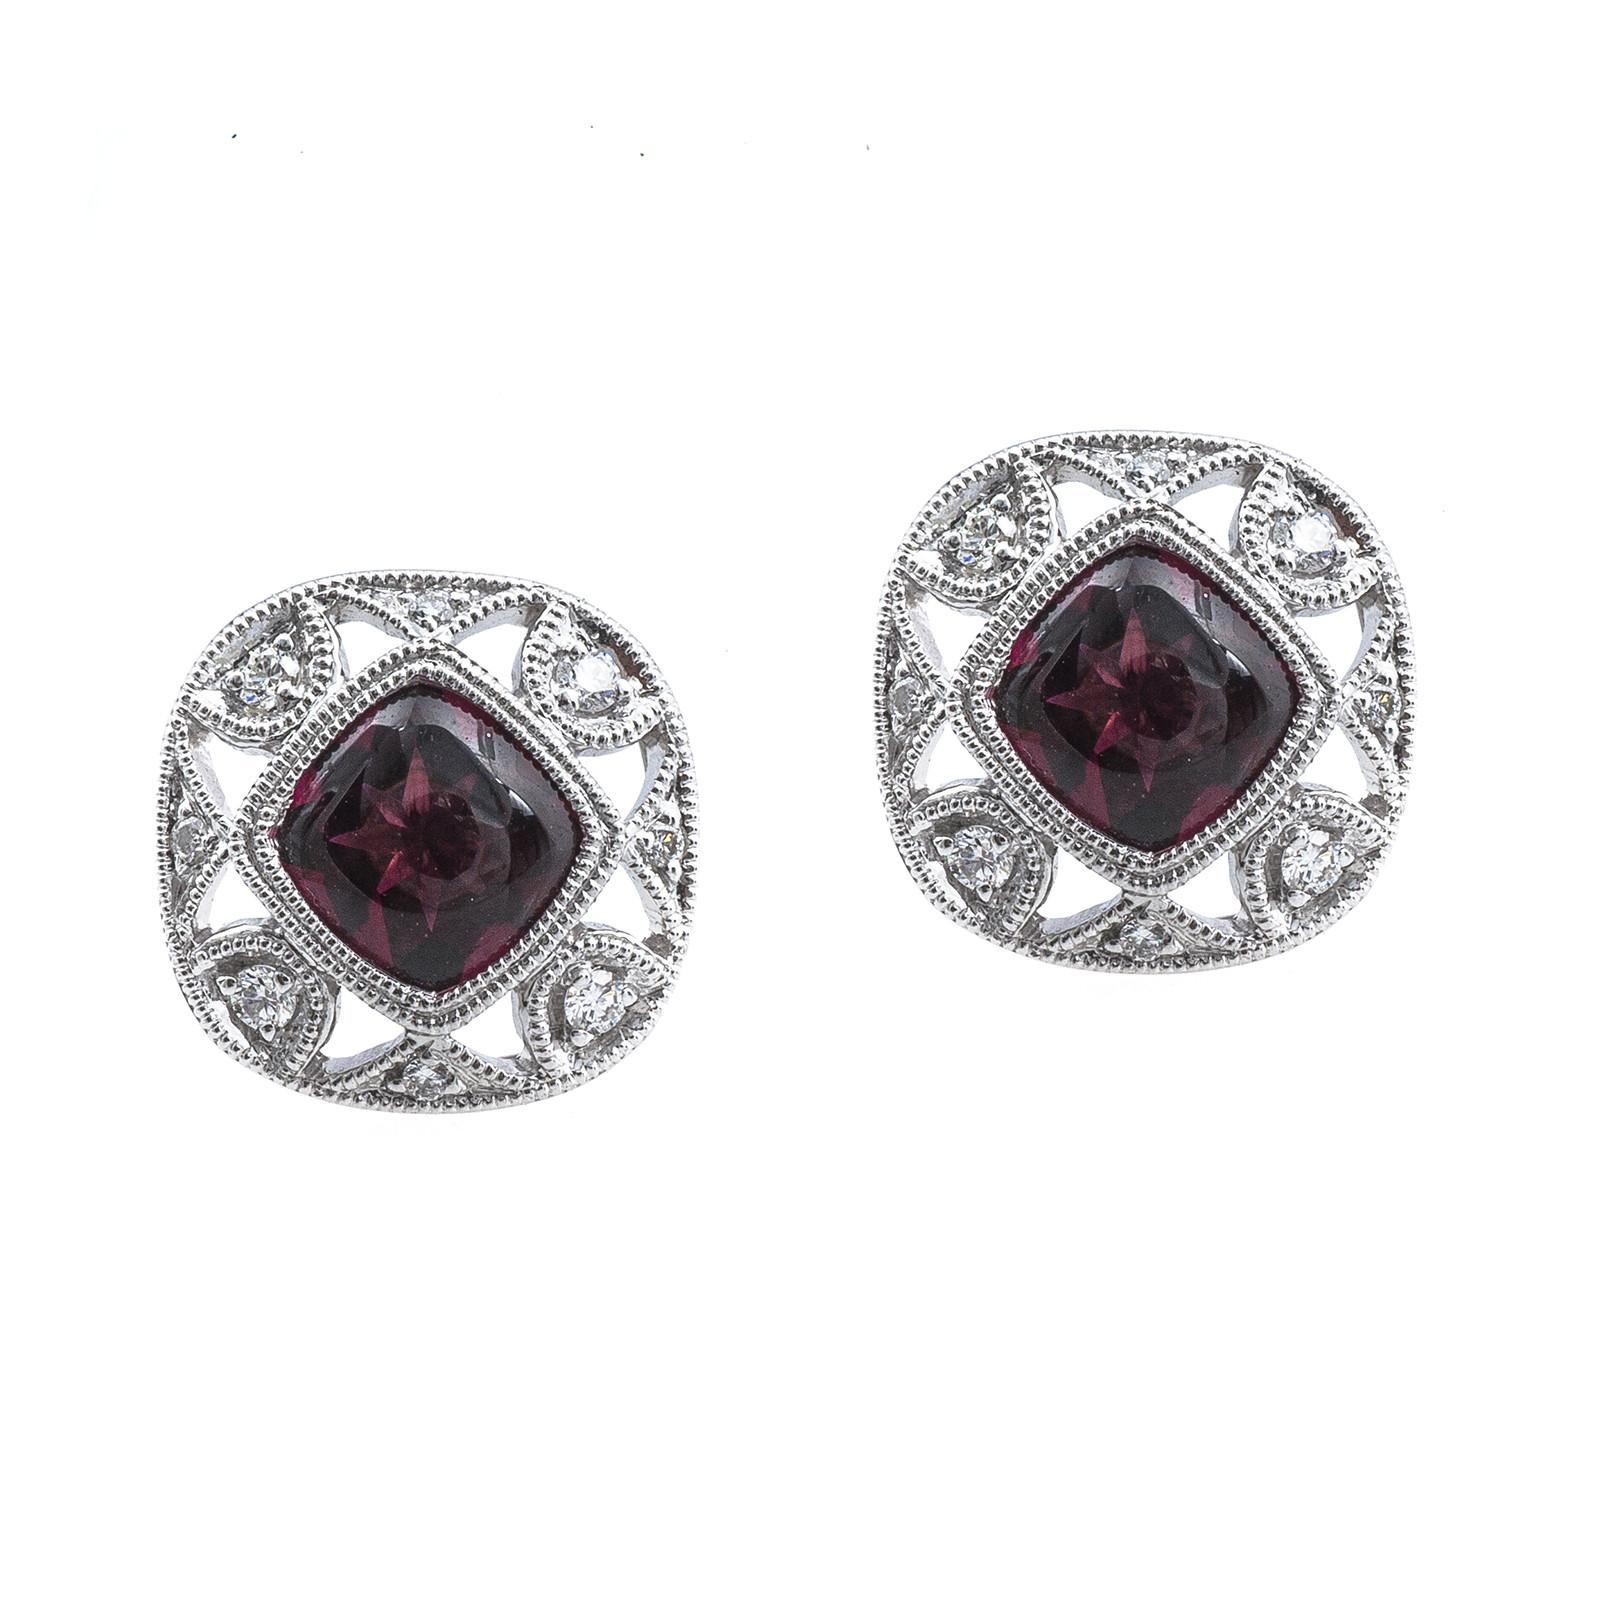 New 2.58 CTW Rhodolite Garnet & Diamond Stud Earrings